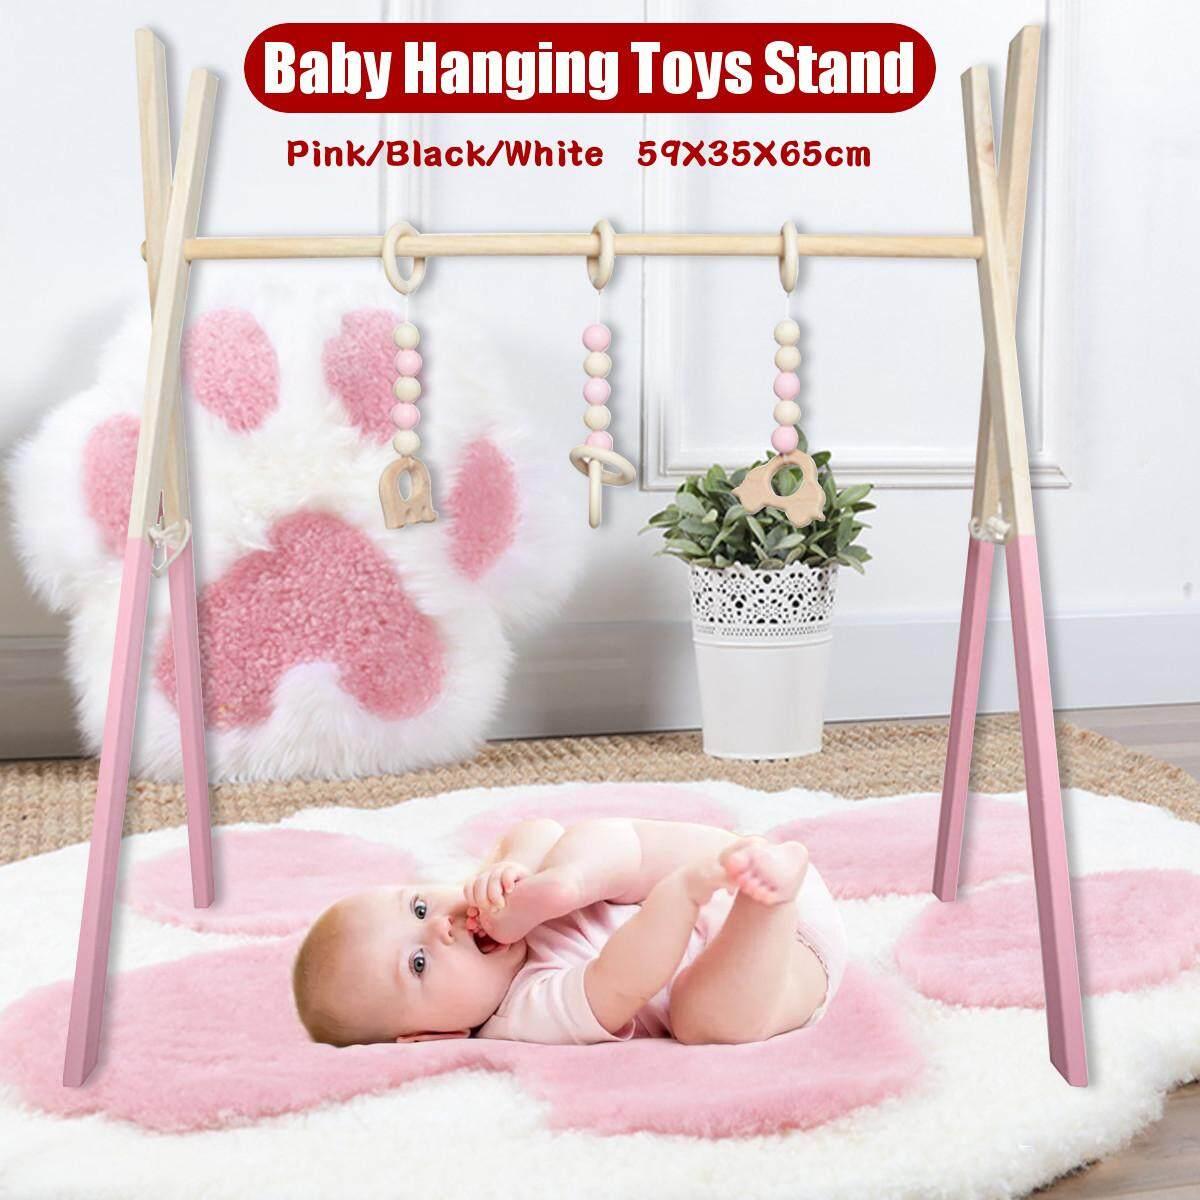 Wood Baby Play Stand Toy Nursery Fun Hanging Toys Mobile Wood Rack Activity Gym Giá Siêu Cạnh Tranh